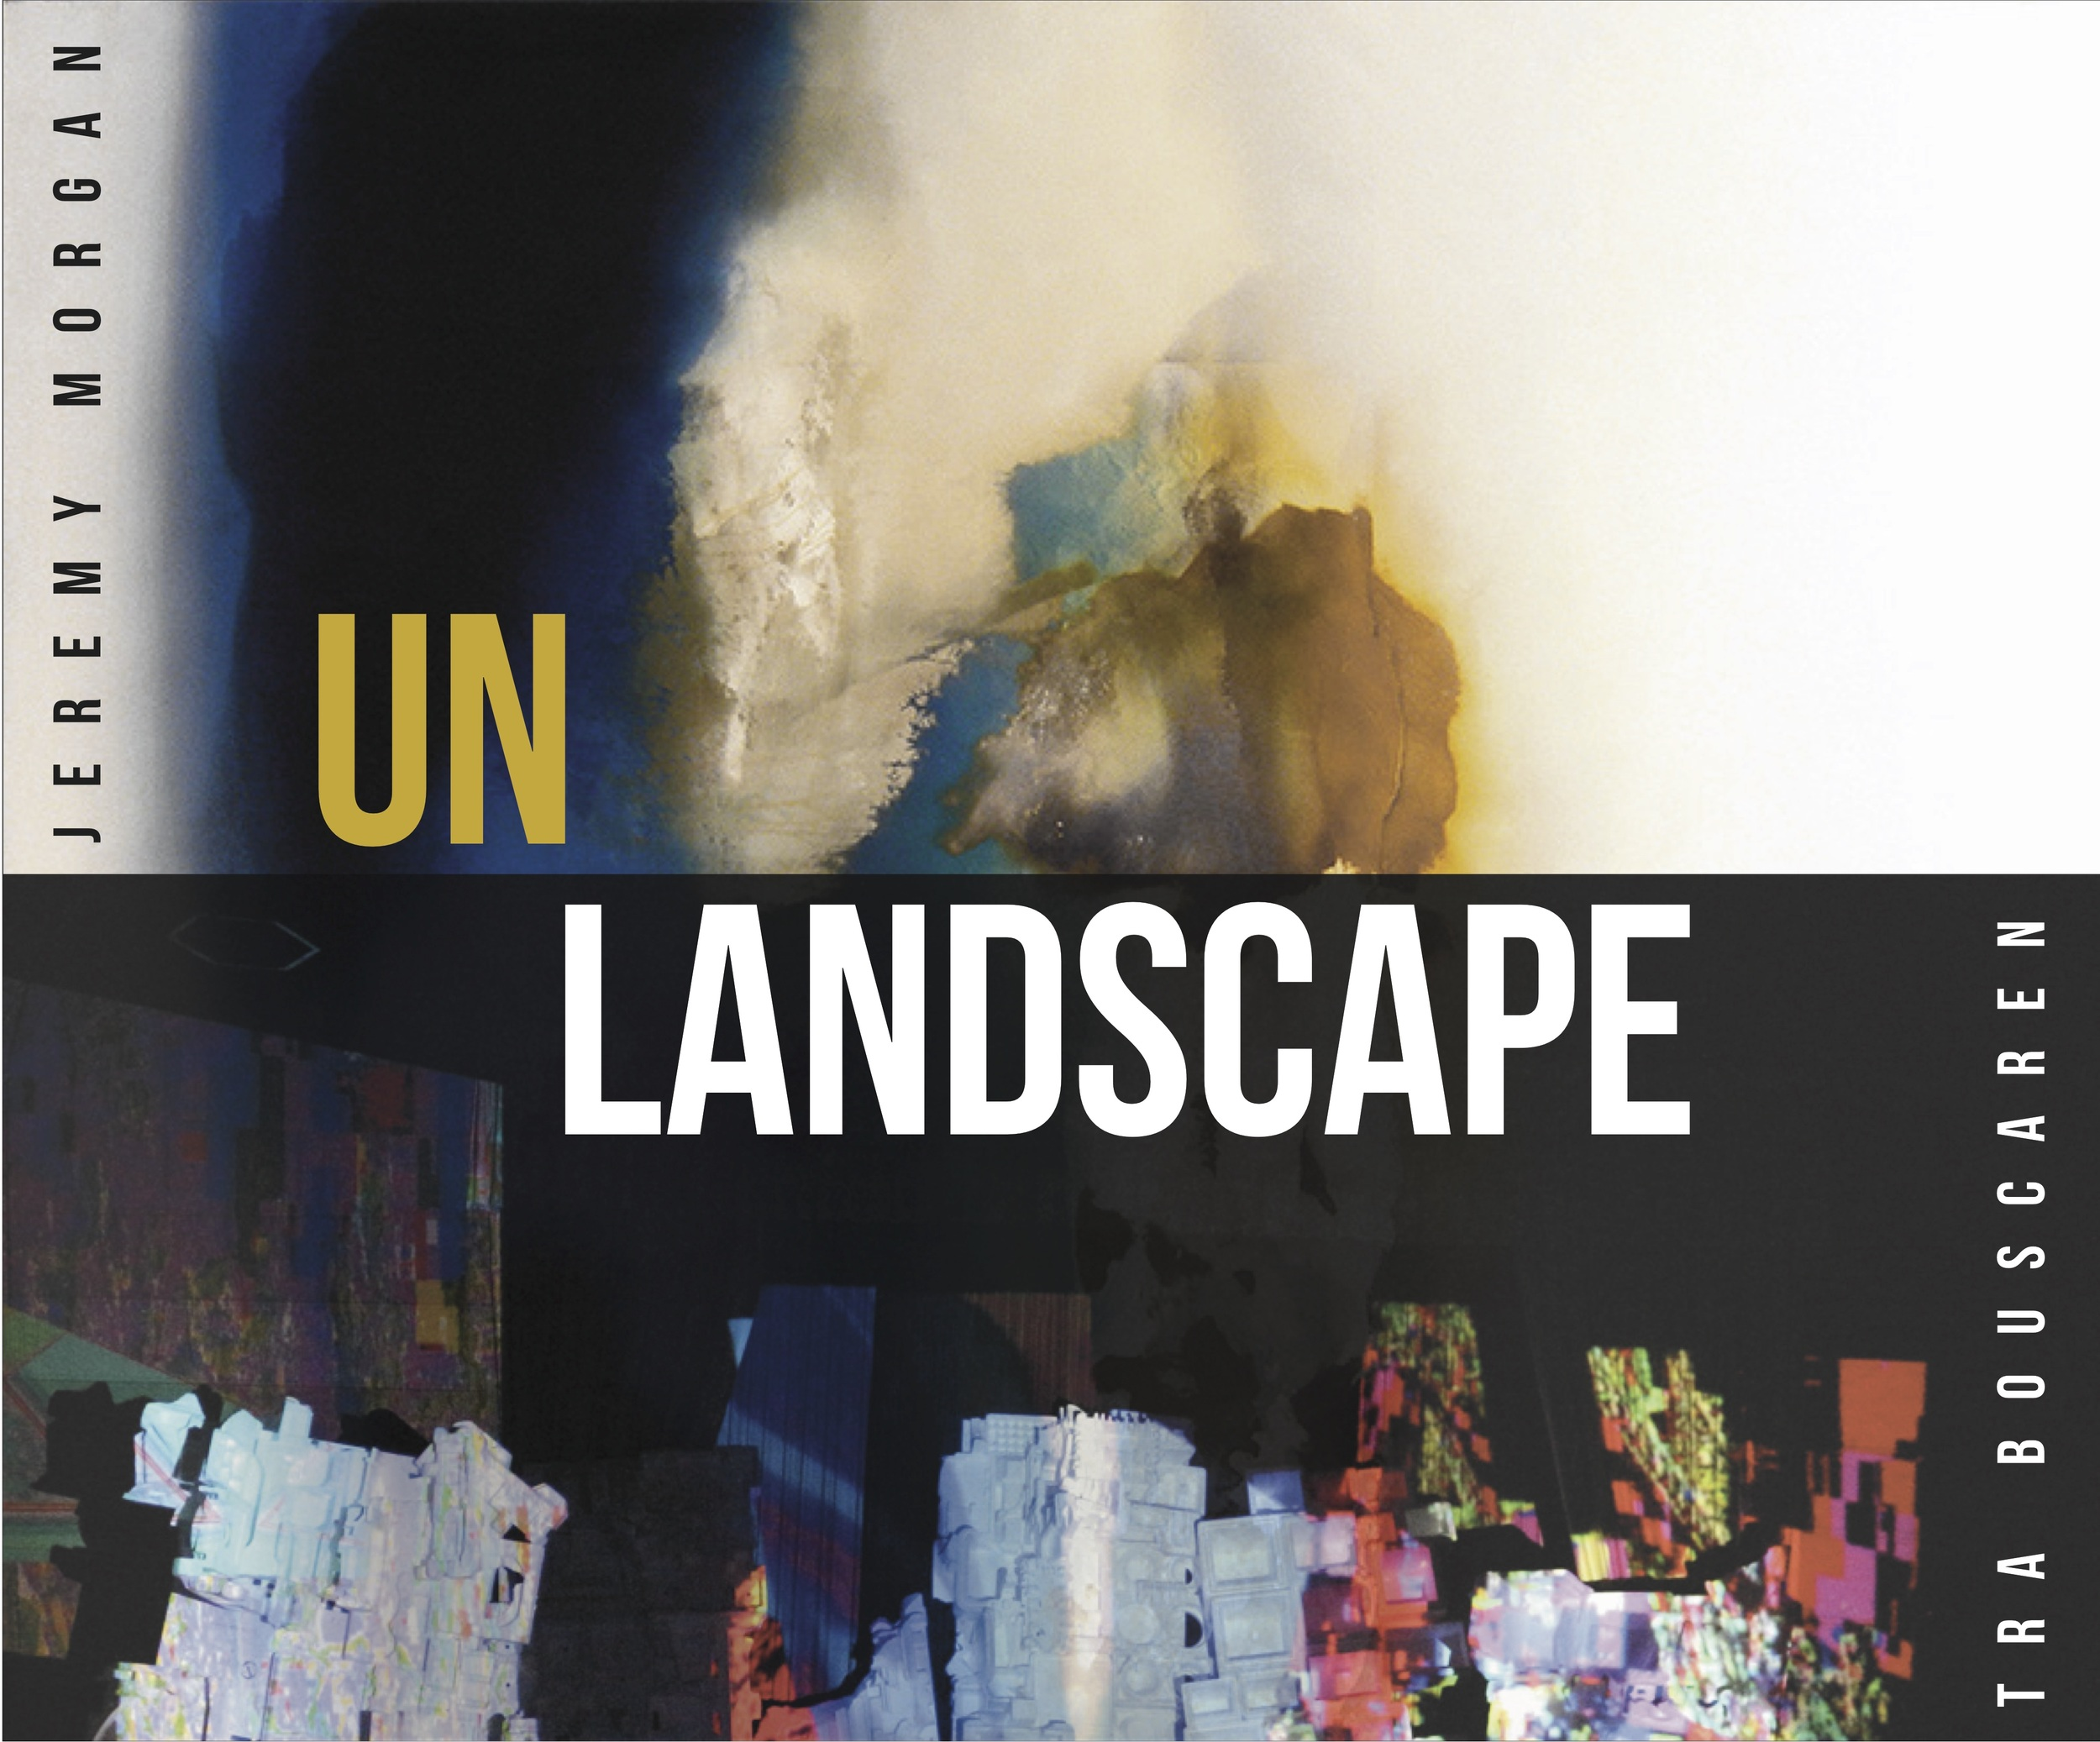 UnLandscape Intro Label.jpg